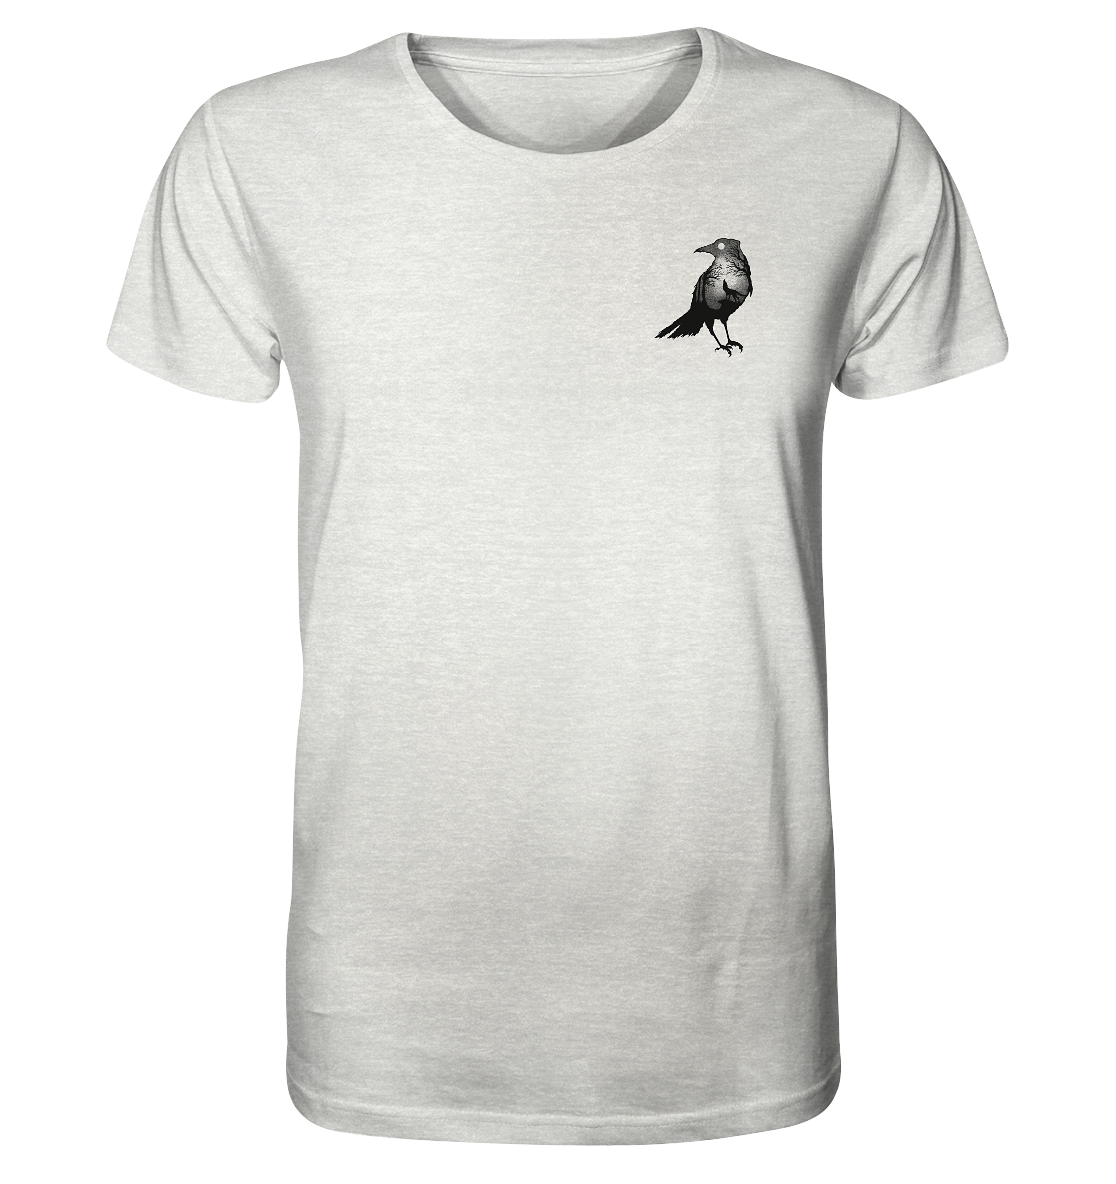 front-organic-shirt-meliert-f2f5f3-1116x-5.png